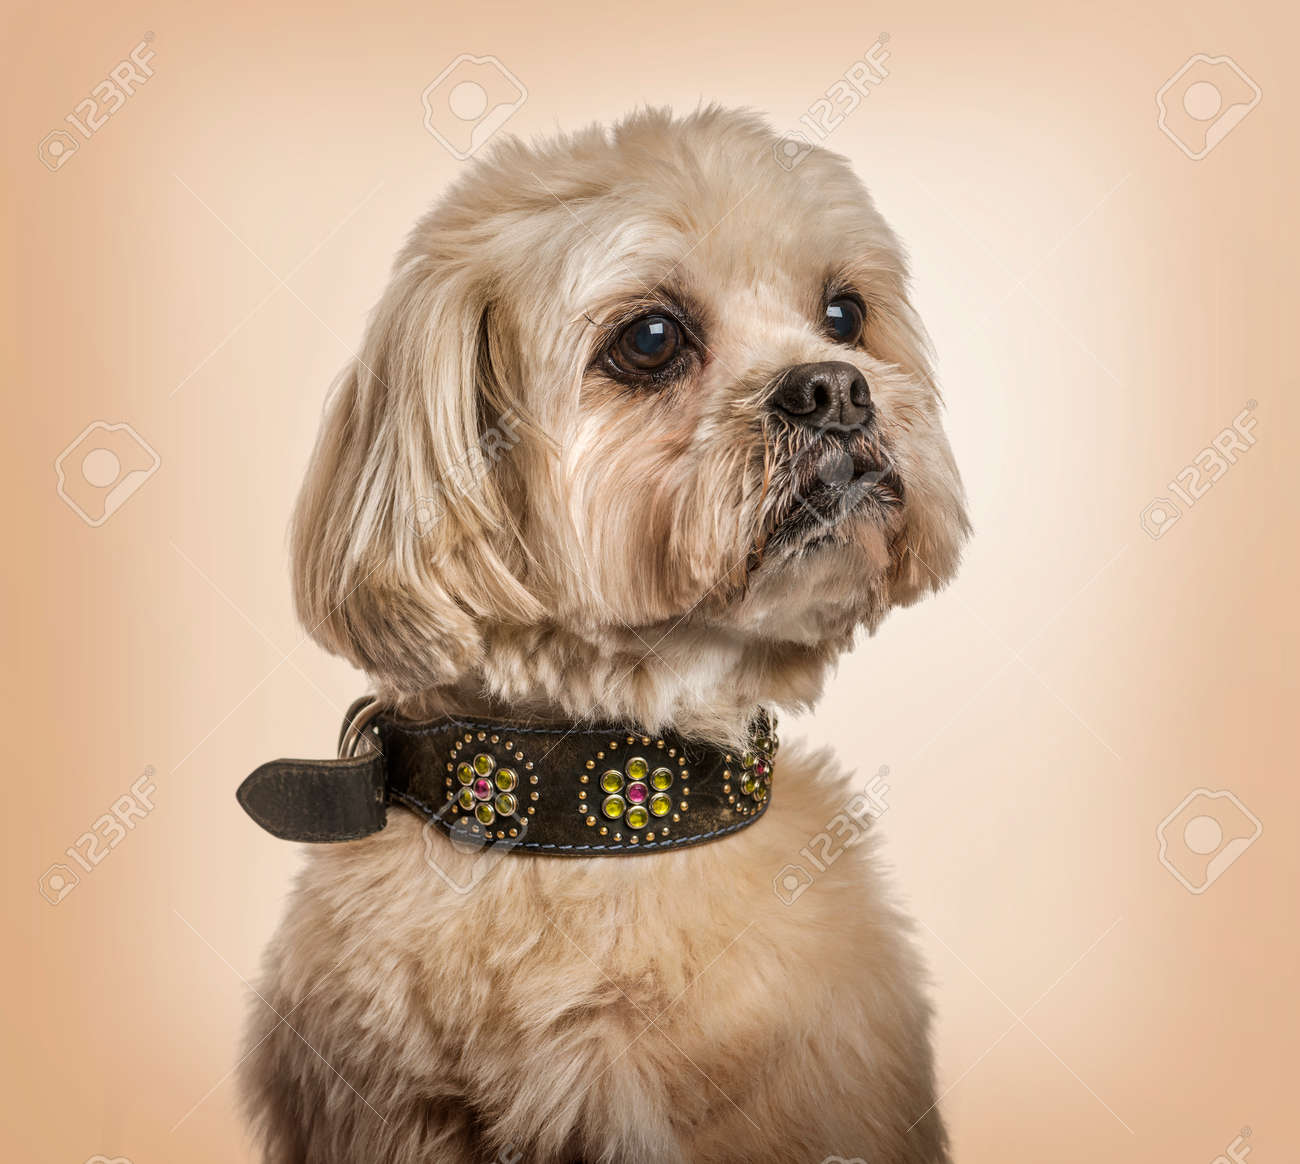 Shih Tzu In Collar Looking Away Against Beige Background Stock Photo